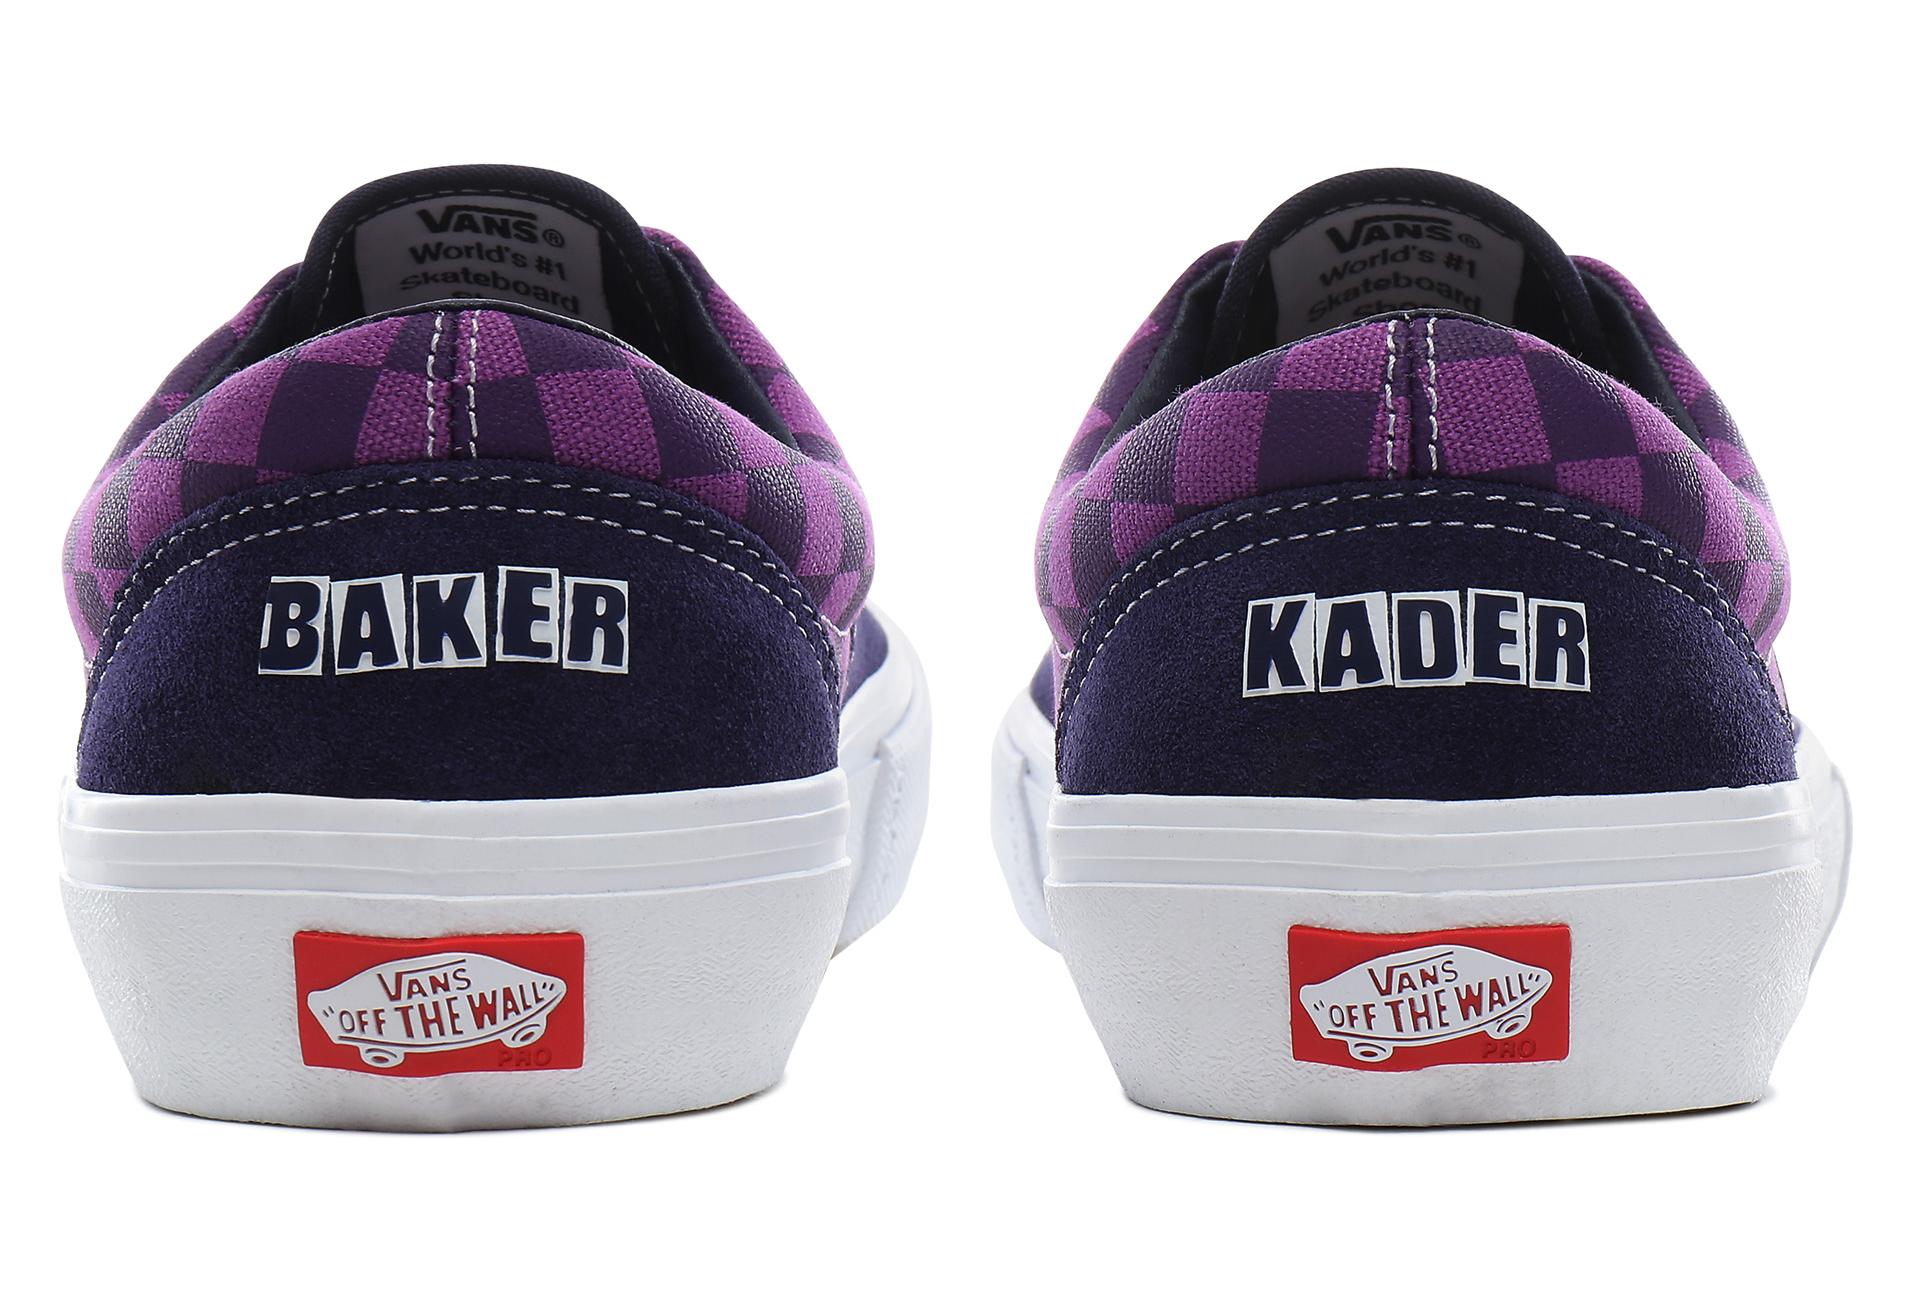 Vans Era Pro Bäckerschuhe Kader Purple Check Purple